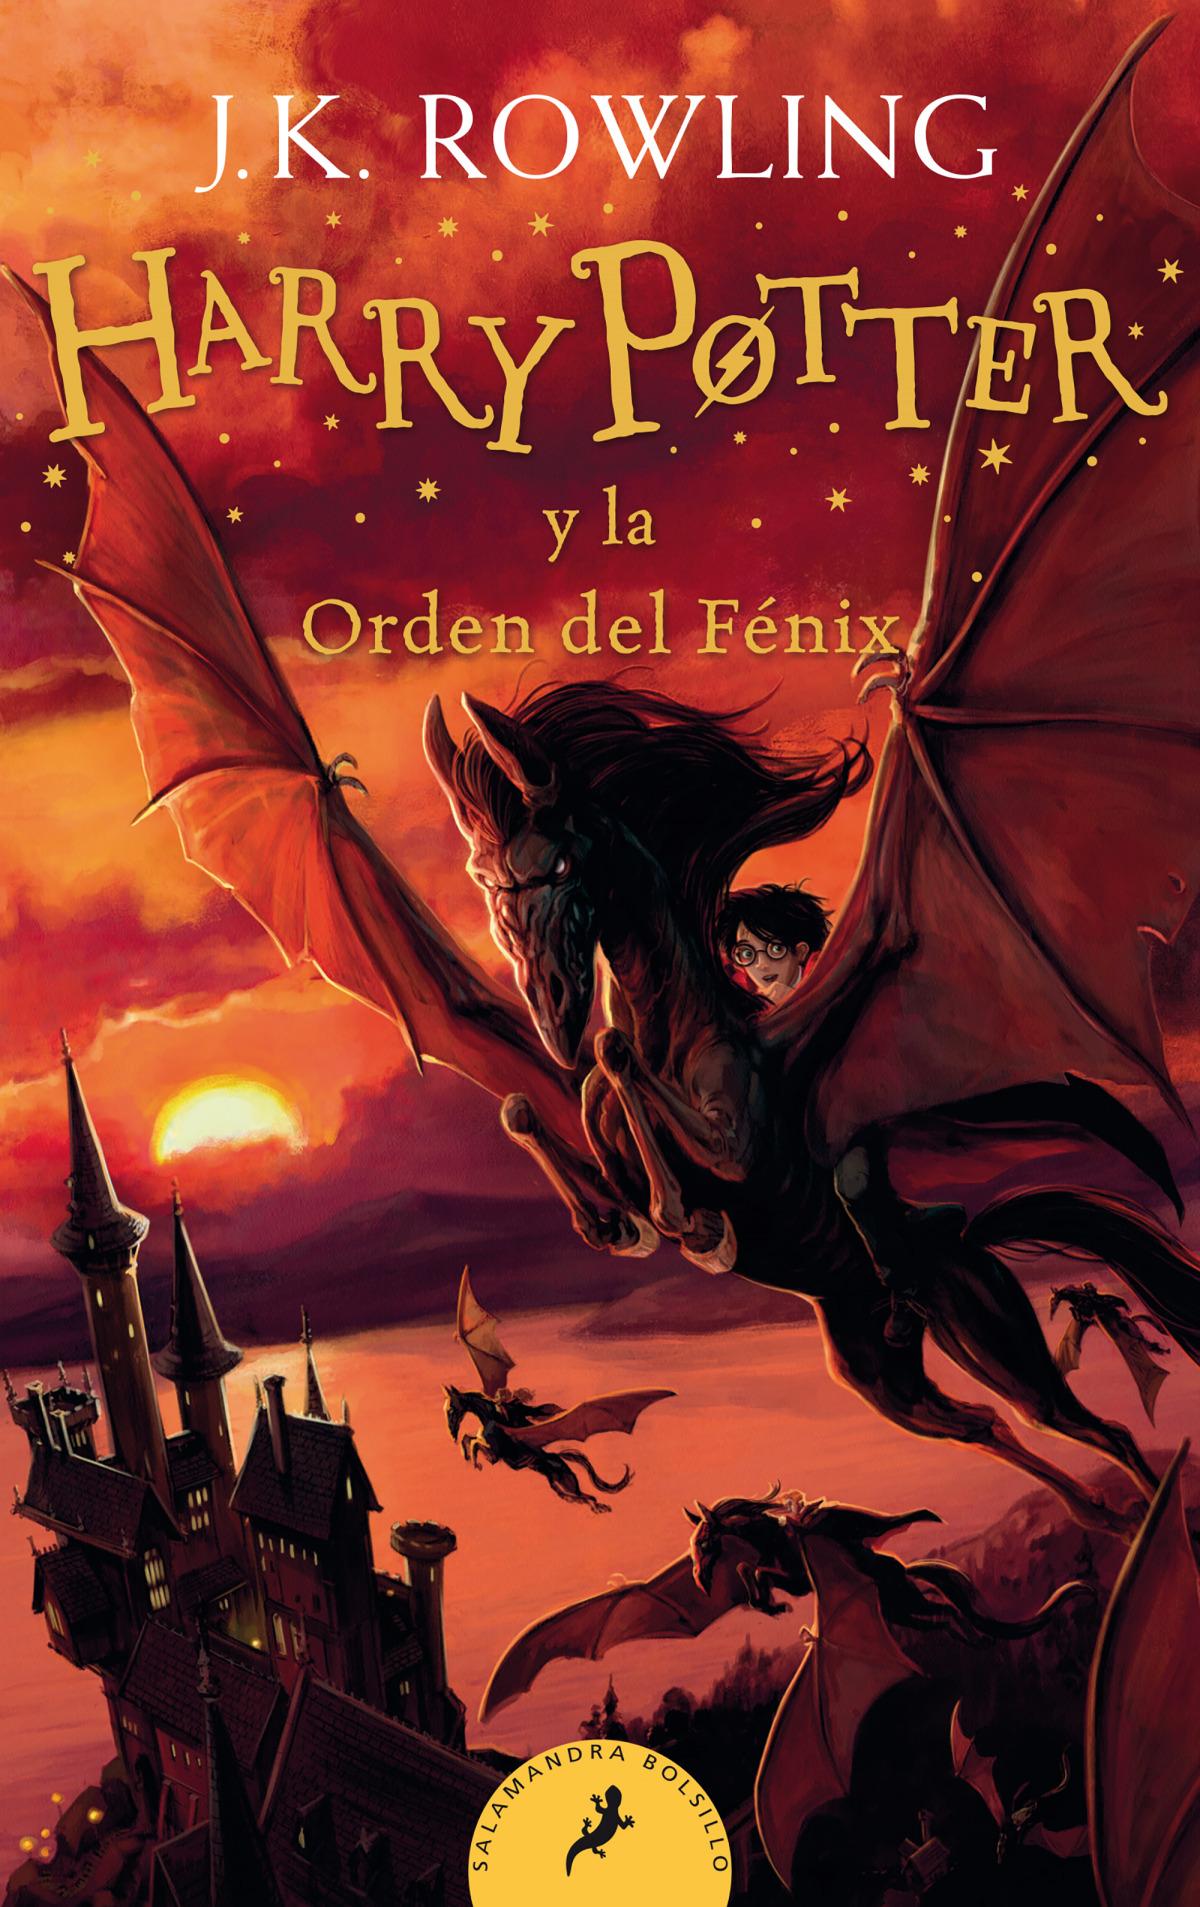 Harry Potter y la Orden del Fénix (Harry Potter 5) 9788418173141